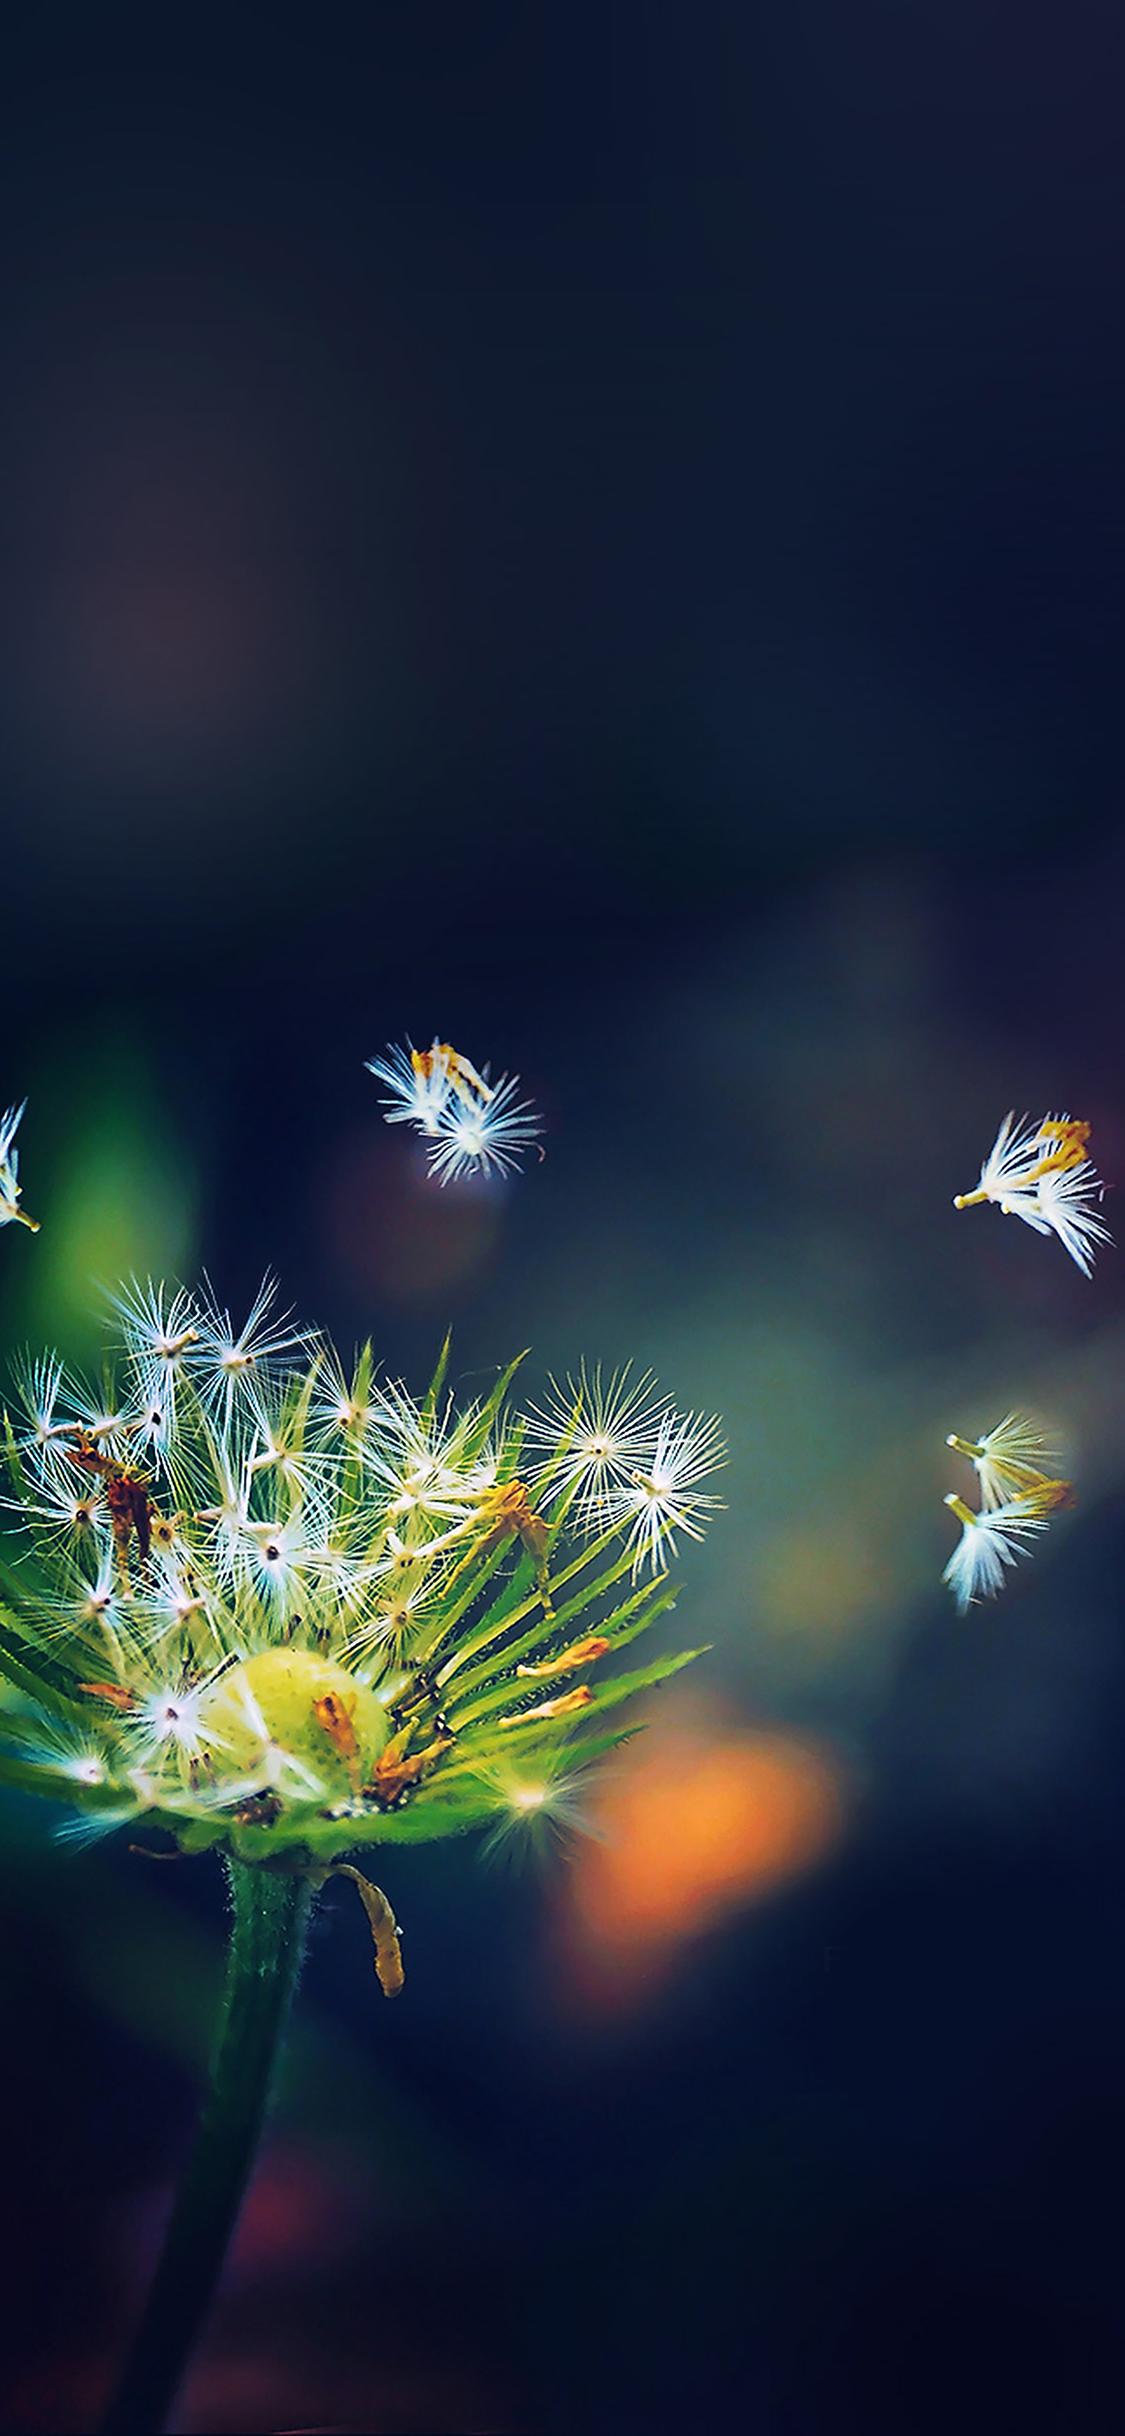 Blowing dandelion flower iPhone X wallpaper